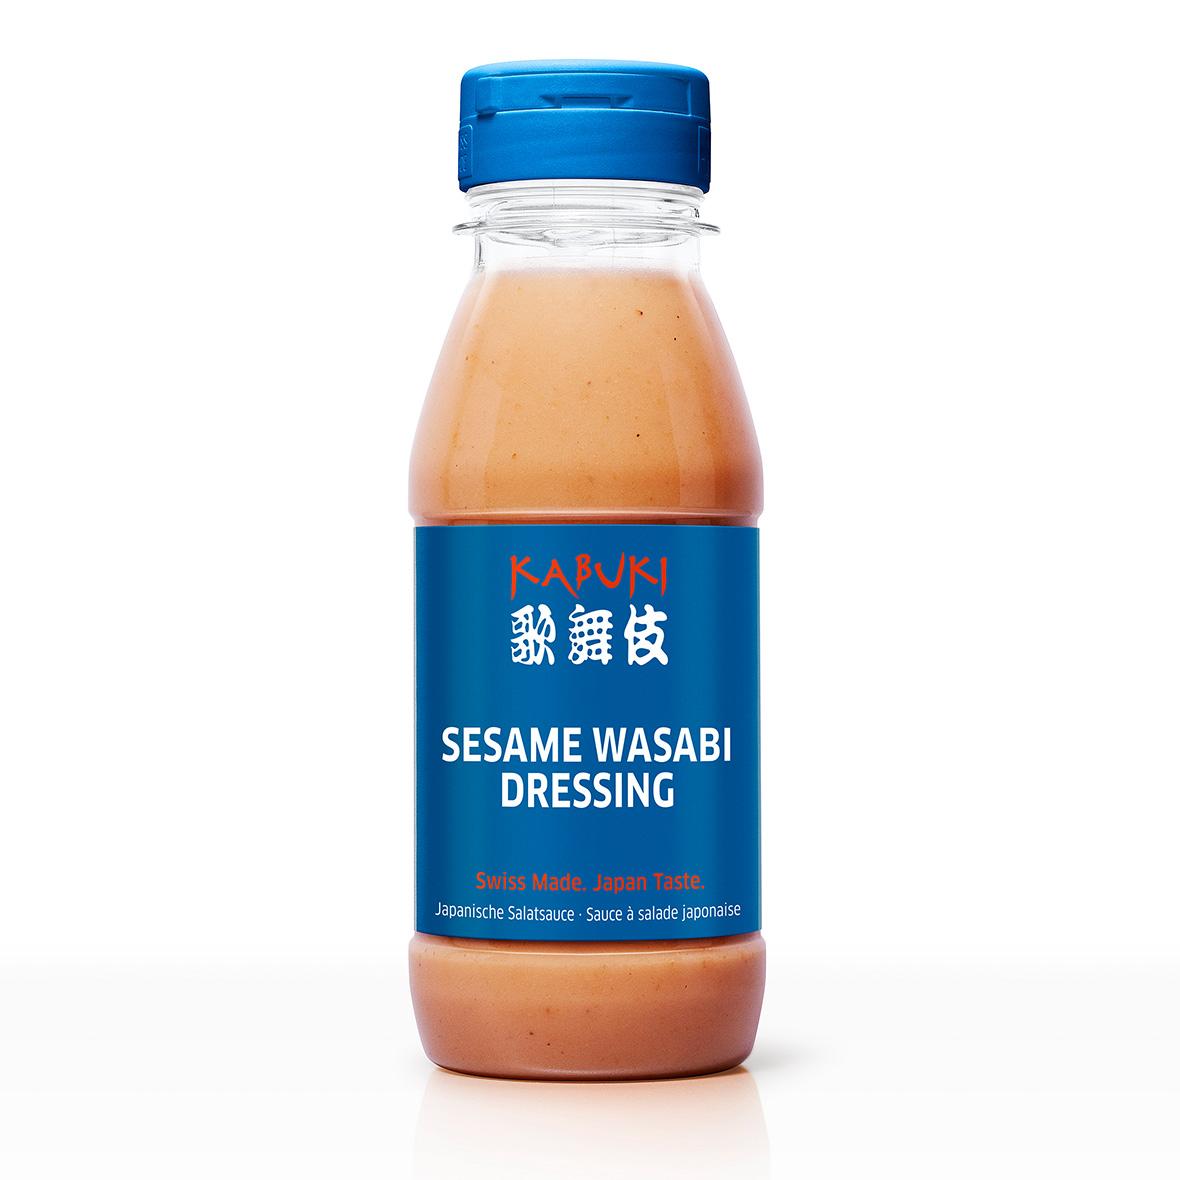 Salatsauce Kabuki Dressing Sesame Wasabi 270 ml